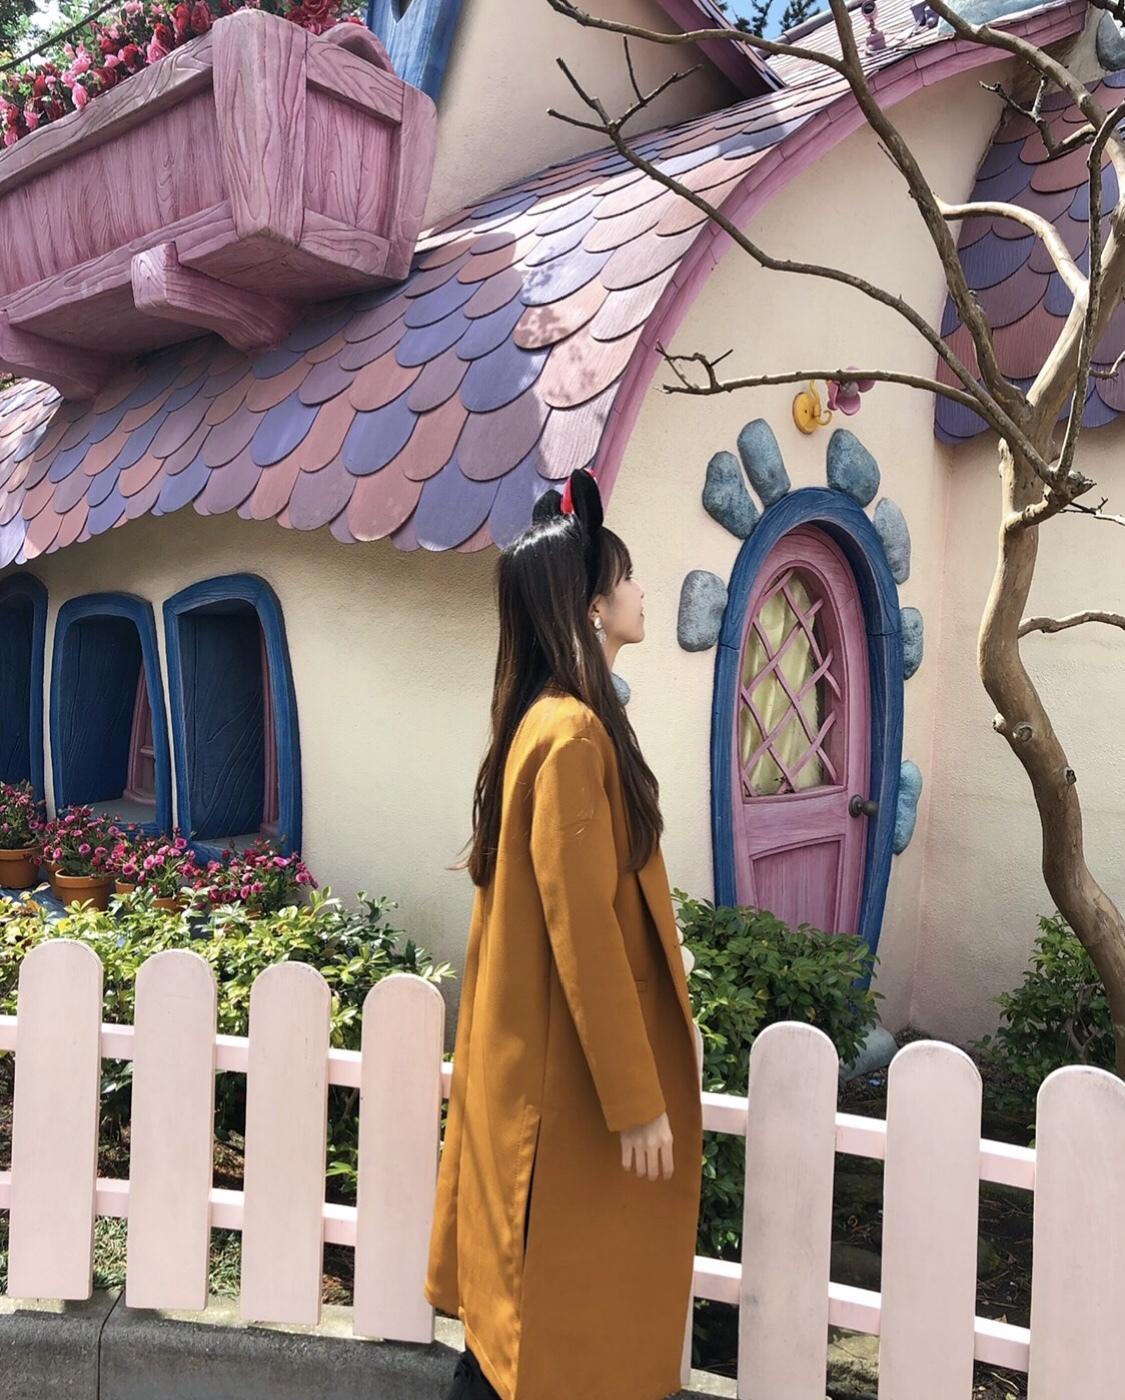 【Disney land】厳選!フォトスポット☺︎_1_3